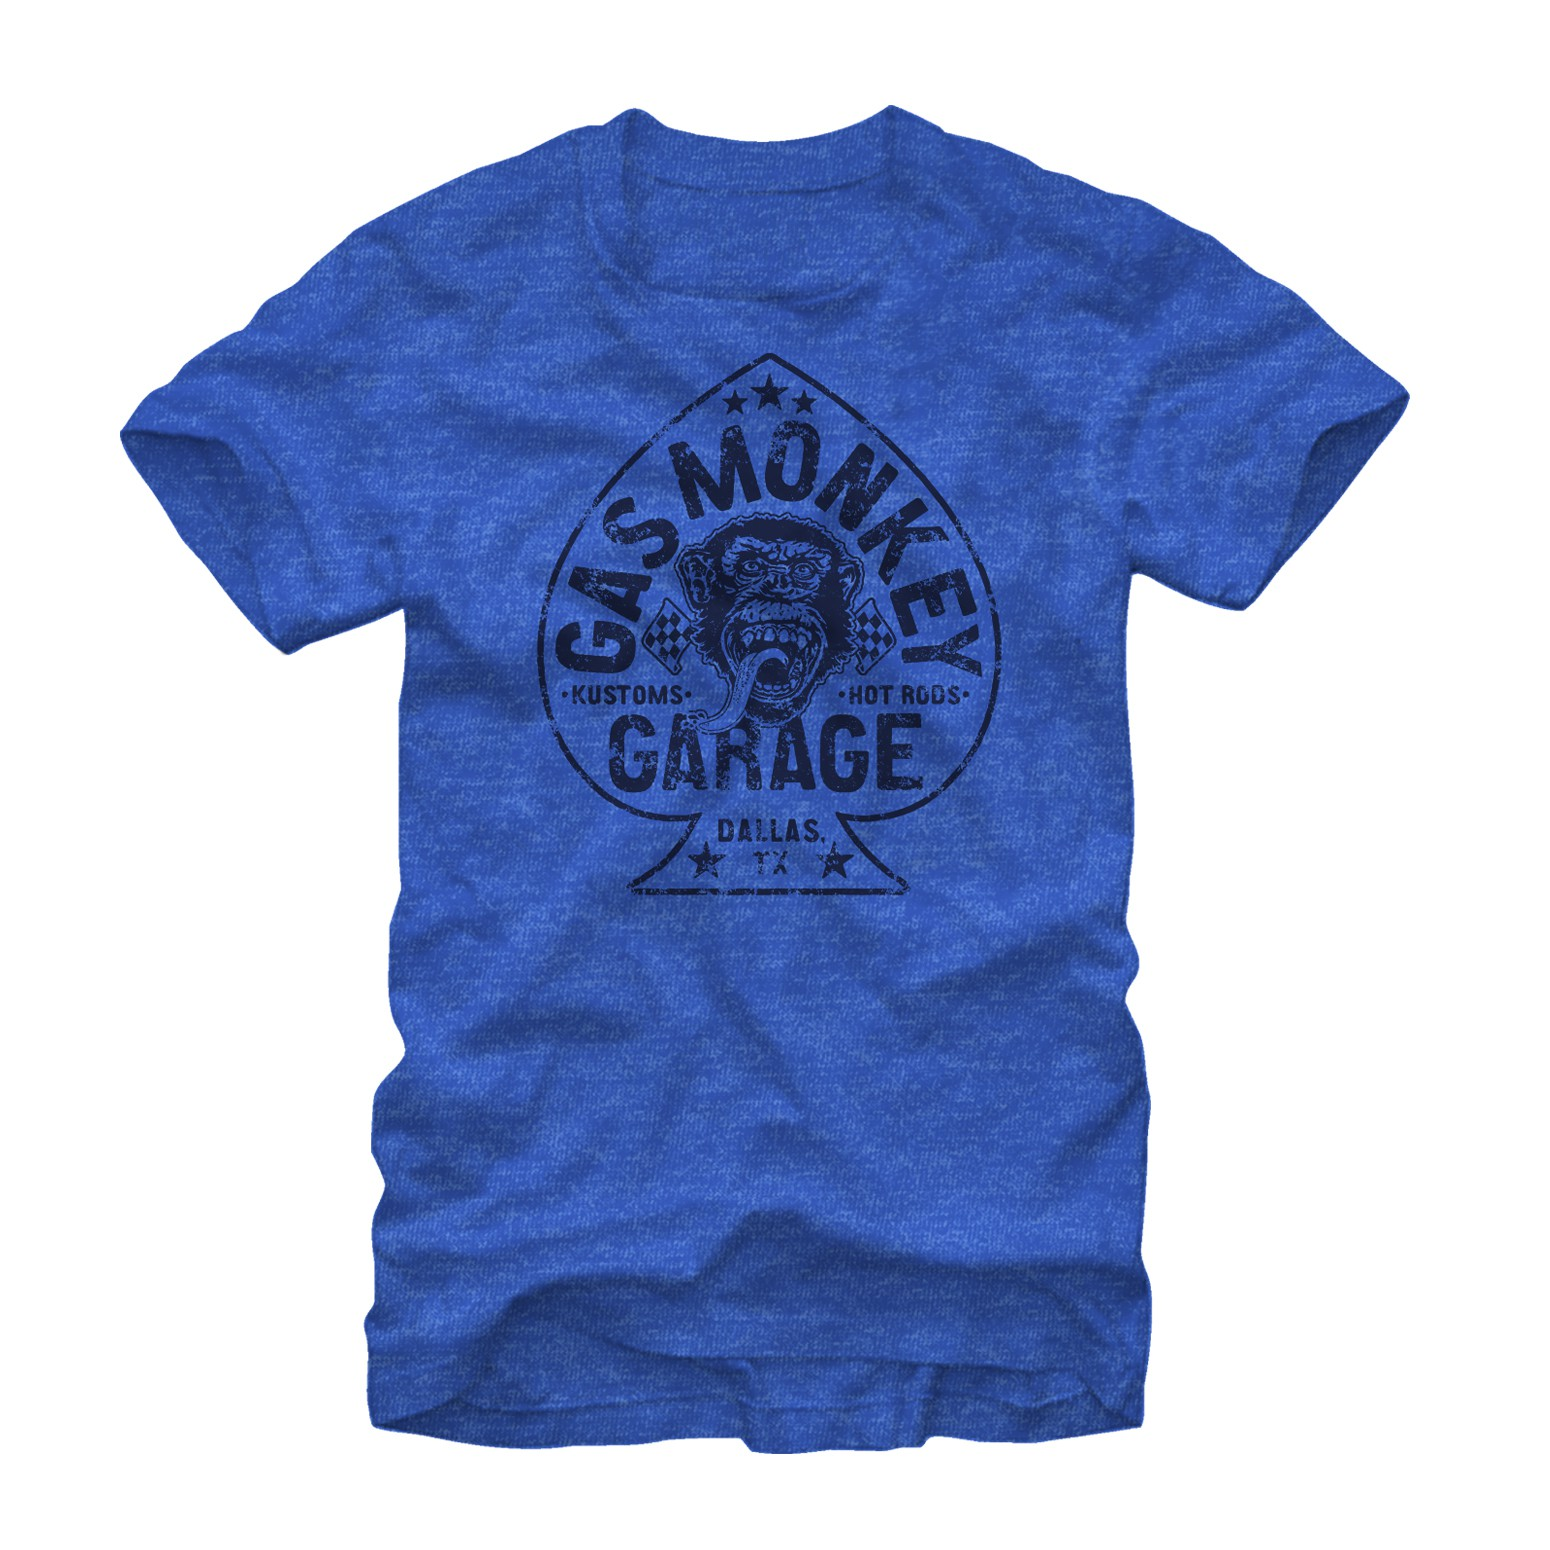 Gas Monkey Garage Aces High Heather Blue T-Shirt